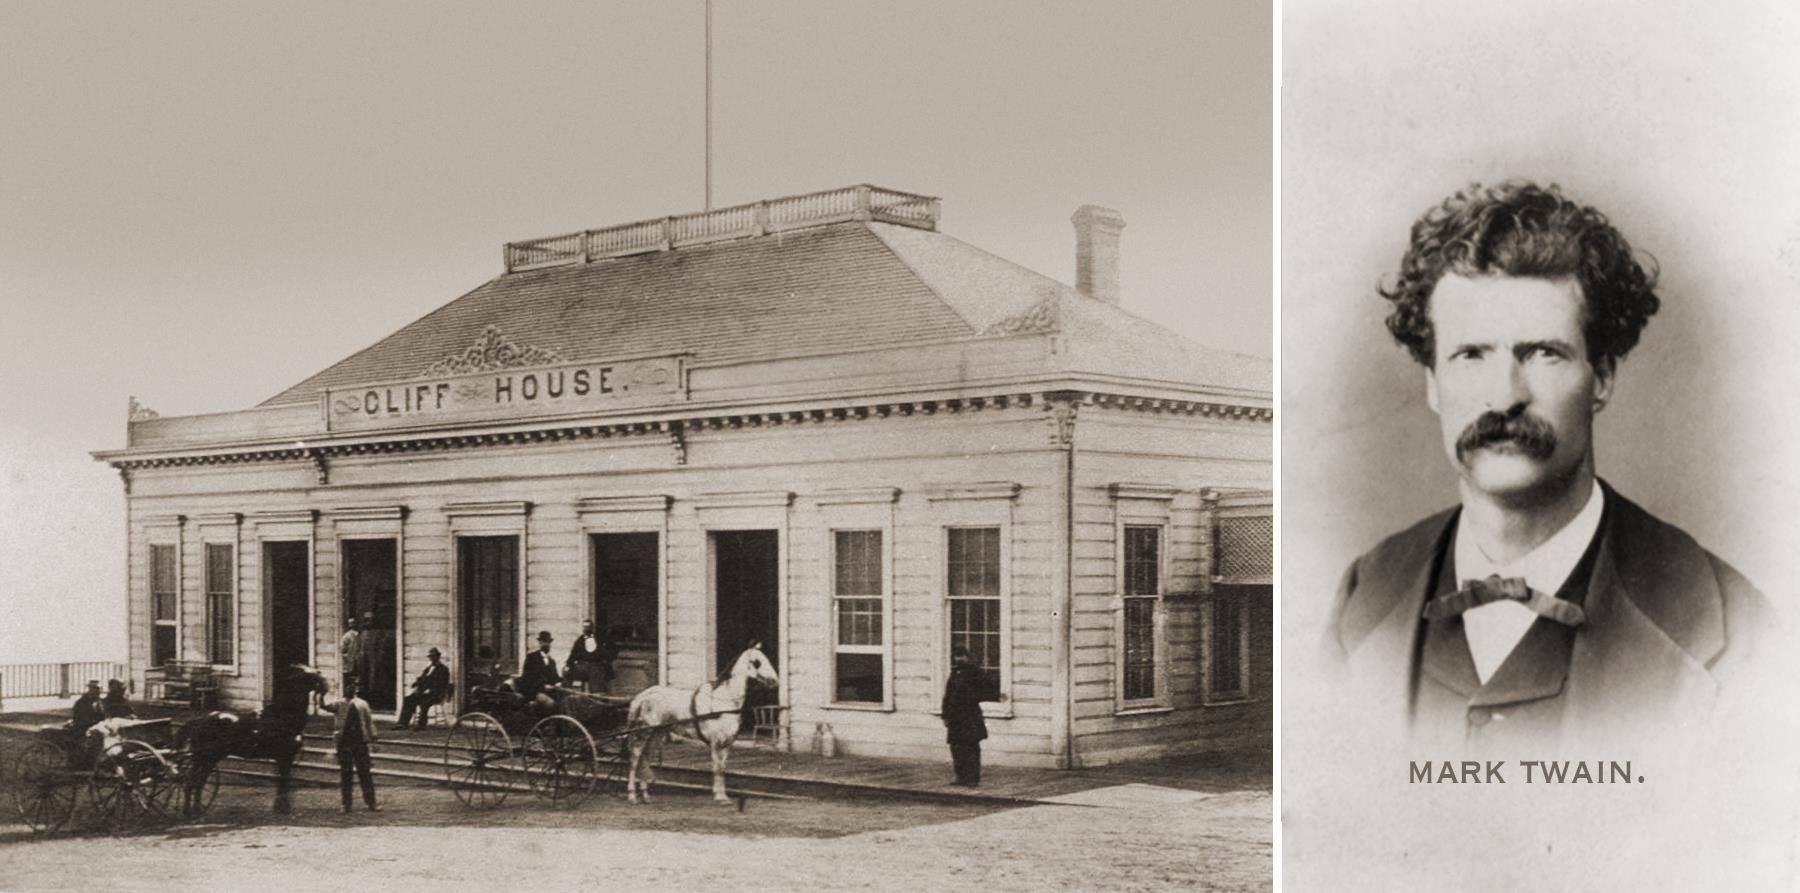 San Francisco 1864 – Mark Twain's Amusing Ride to the Cliff House